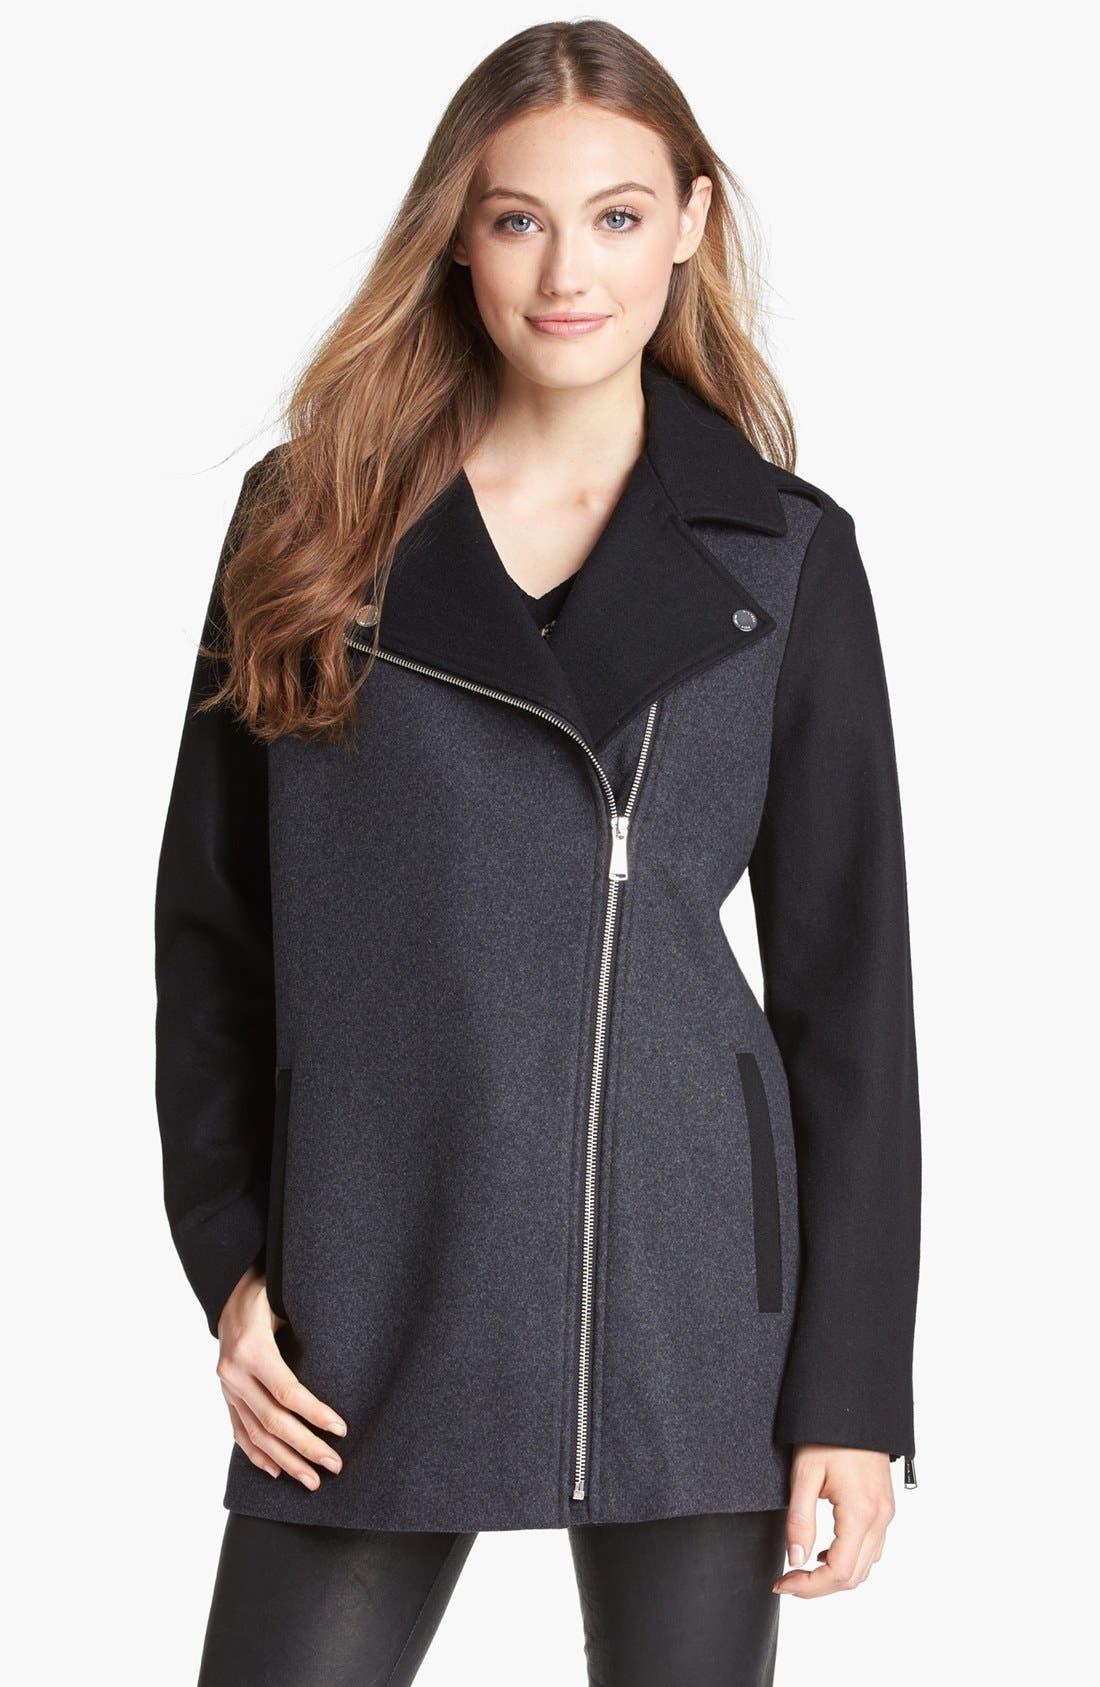 Alternate Image 1 Selected - MICHAEL Michael Kors Two-Tone Asymmetrical Zip Jacket